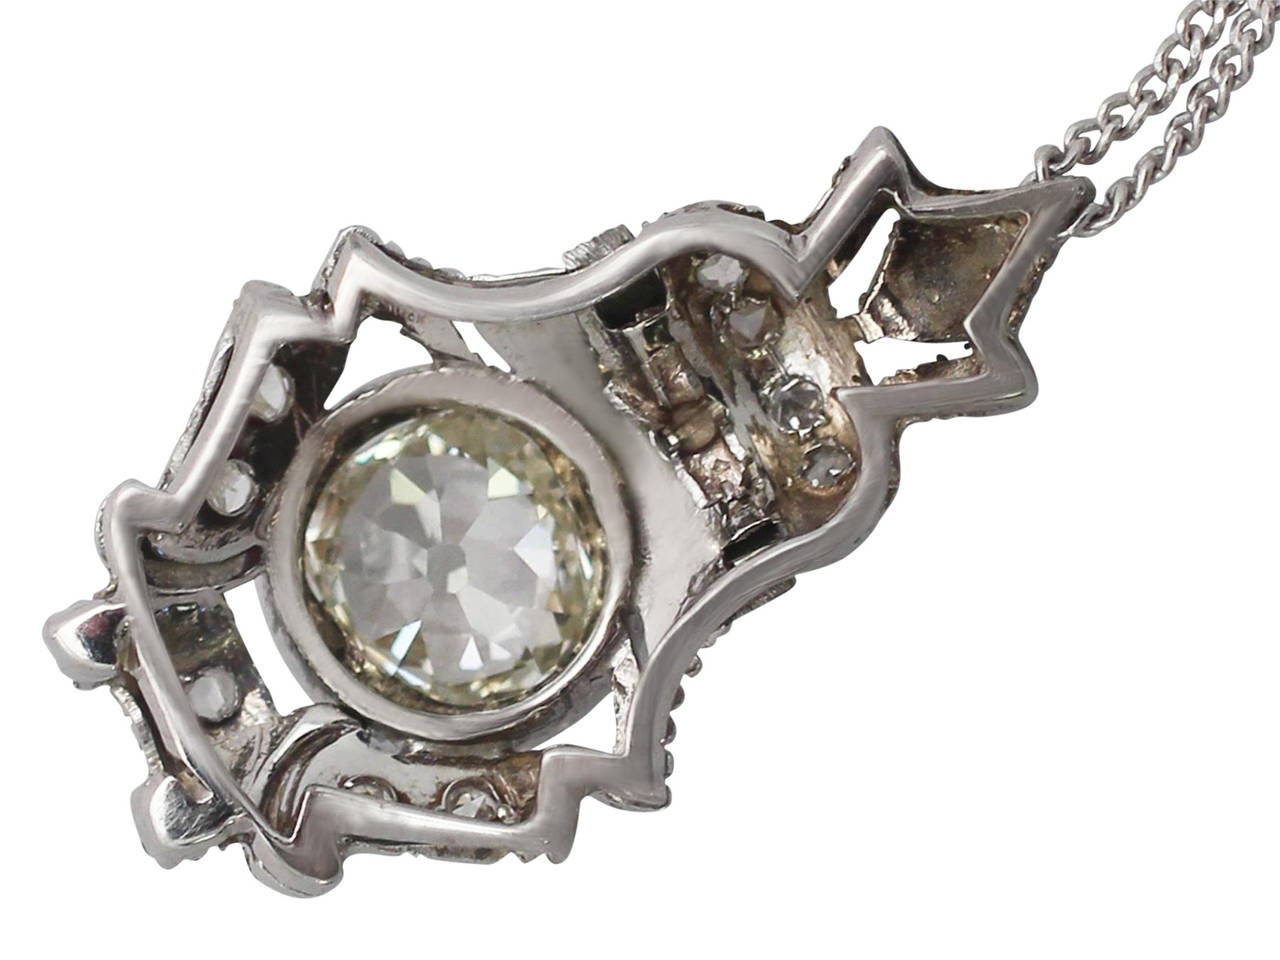 0.84 Carat Diamond and 18 Karat White Gold Pendant, Antique, circa 1900 For Sale 2